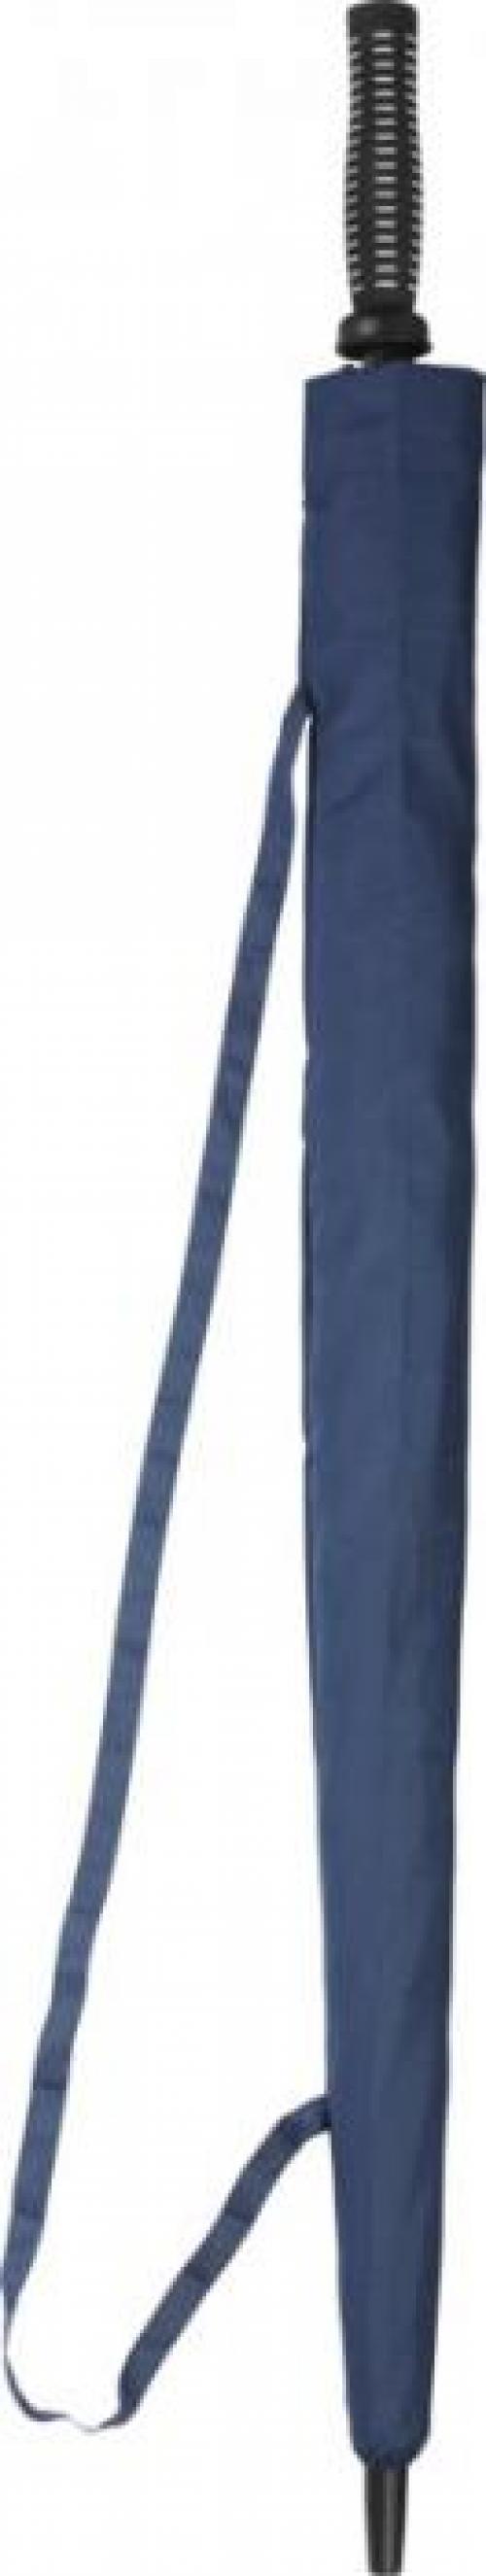 Paraguas extra grande de golf con Ø 142 cm Bedford